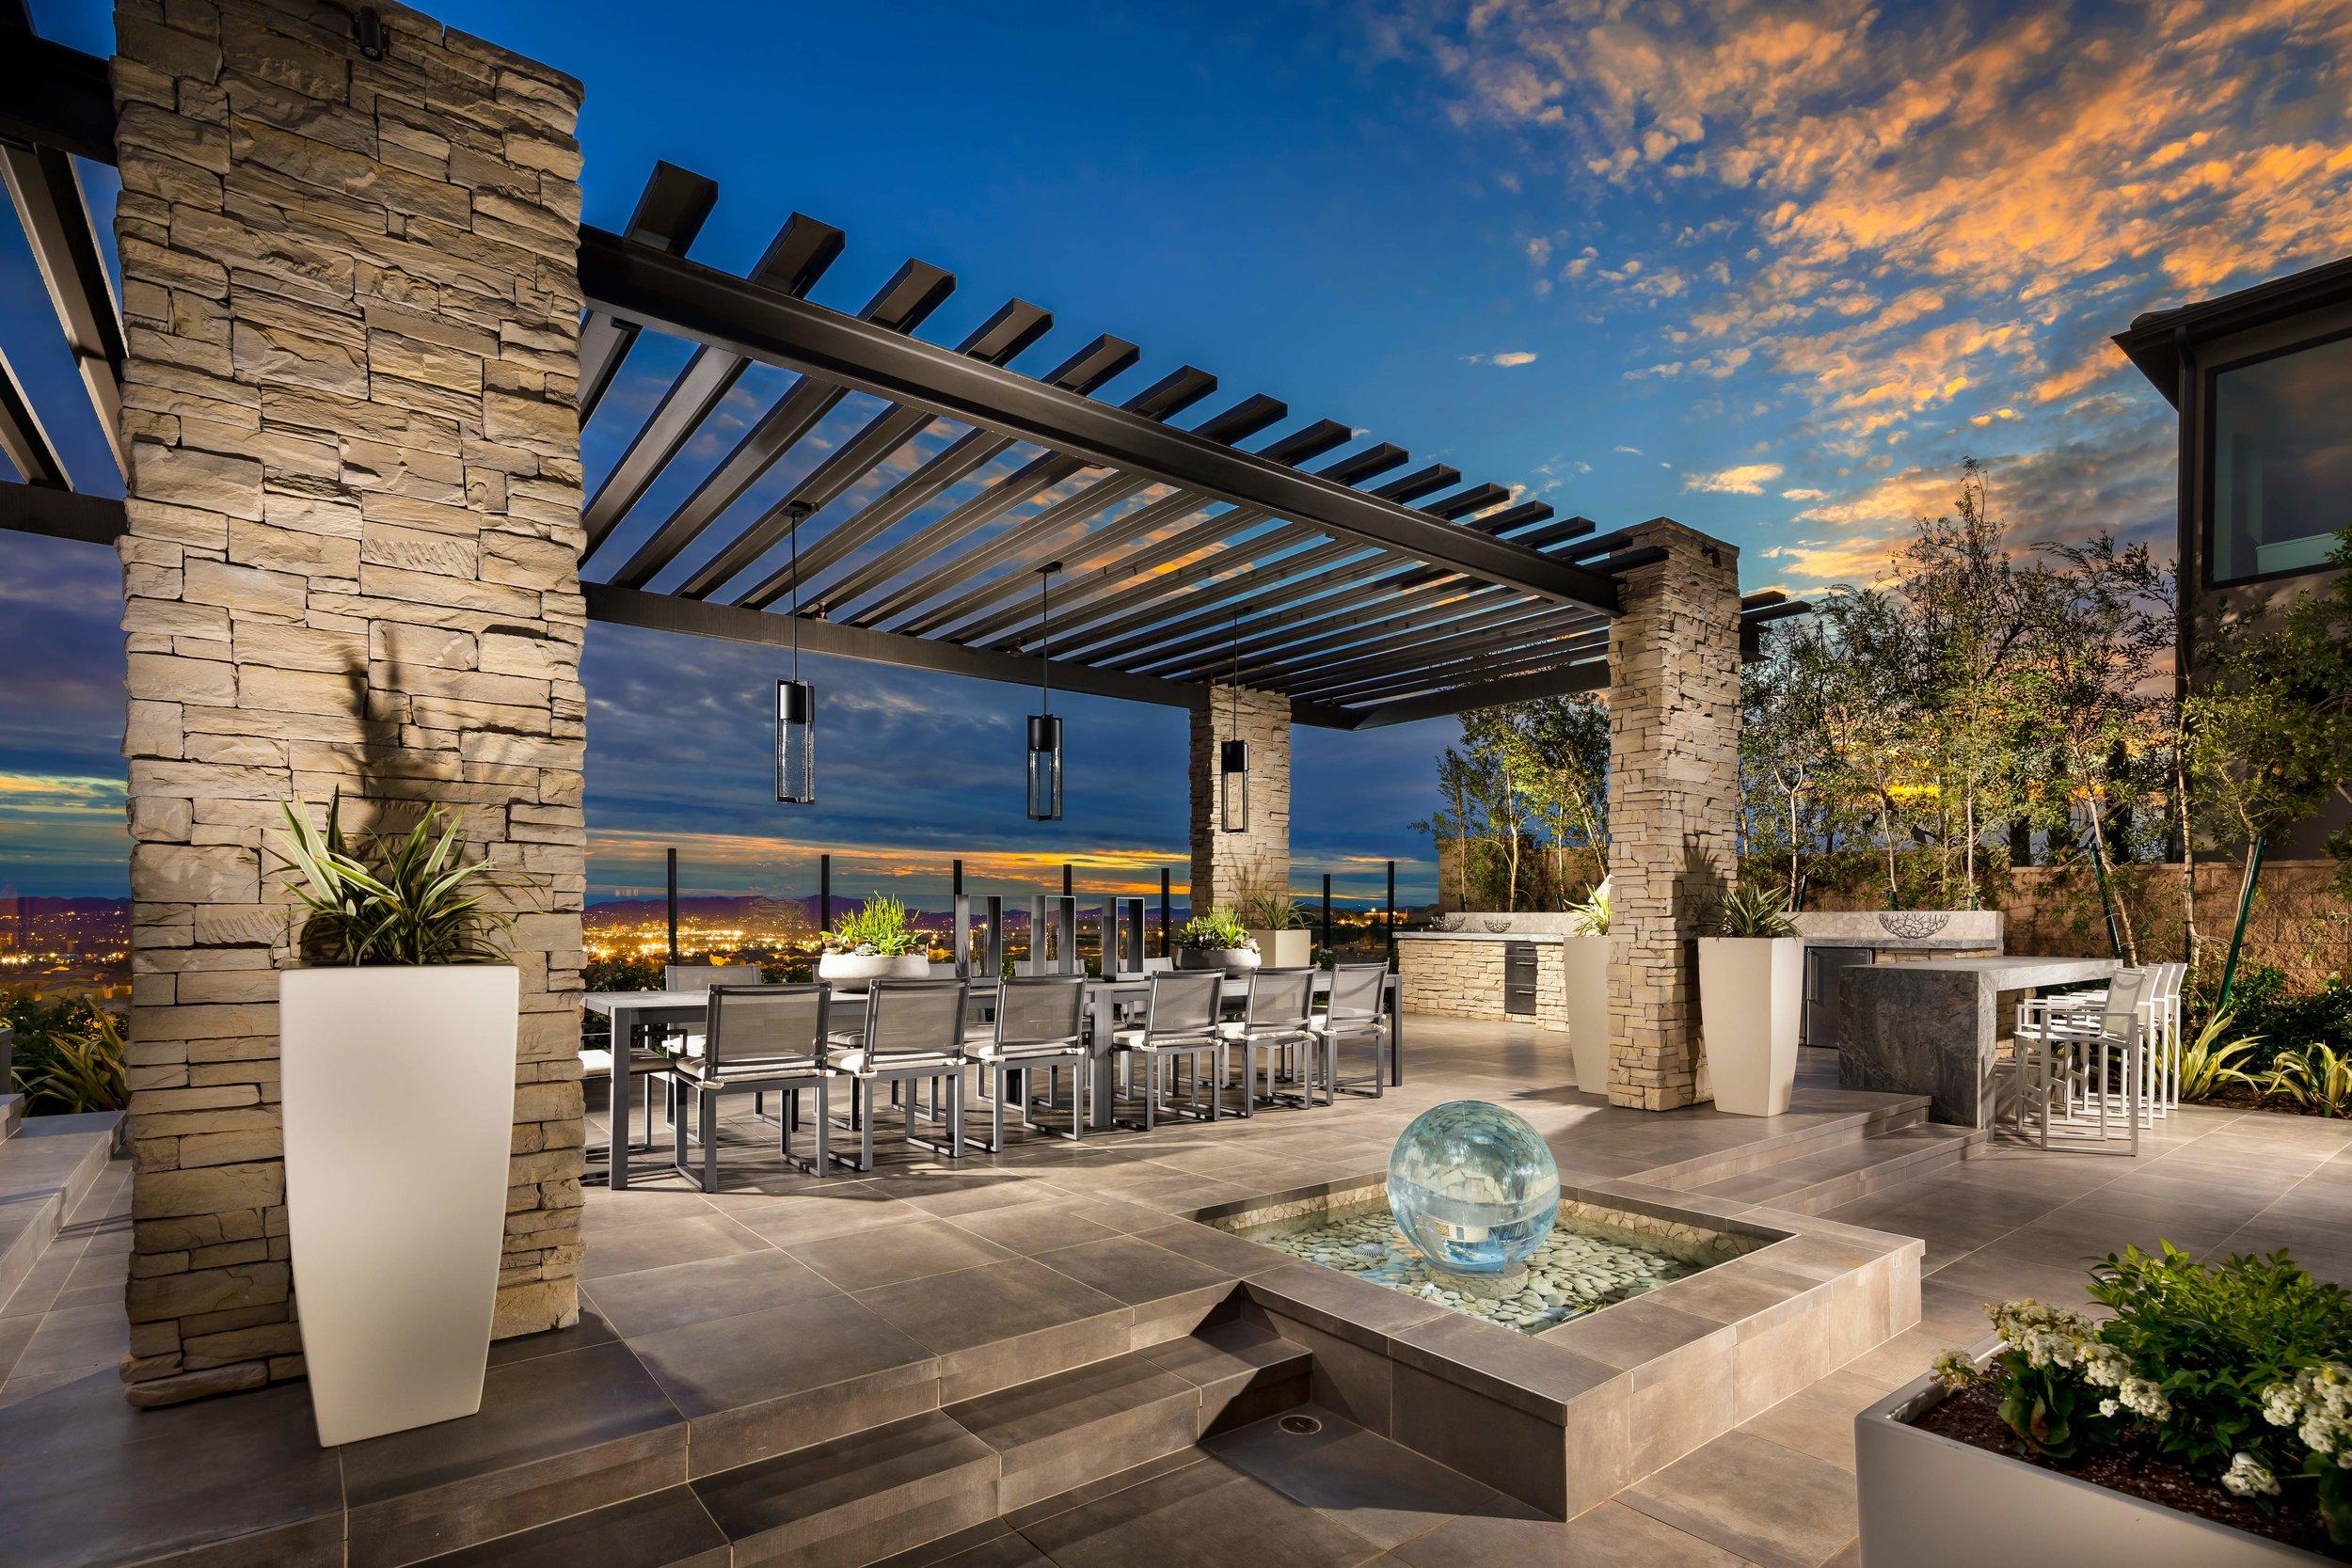 2-Cascades-Vega_Outdoor Dining Patio.jpg